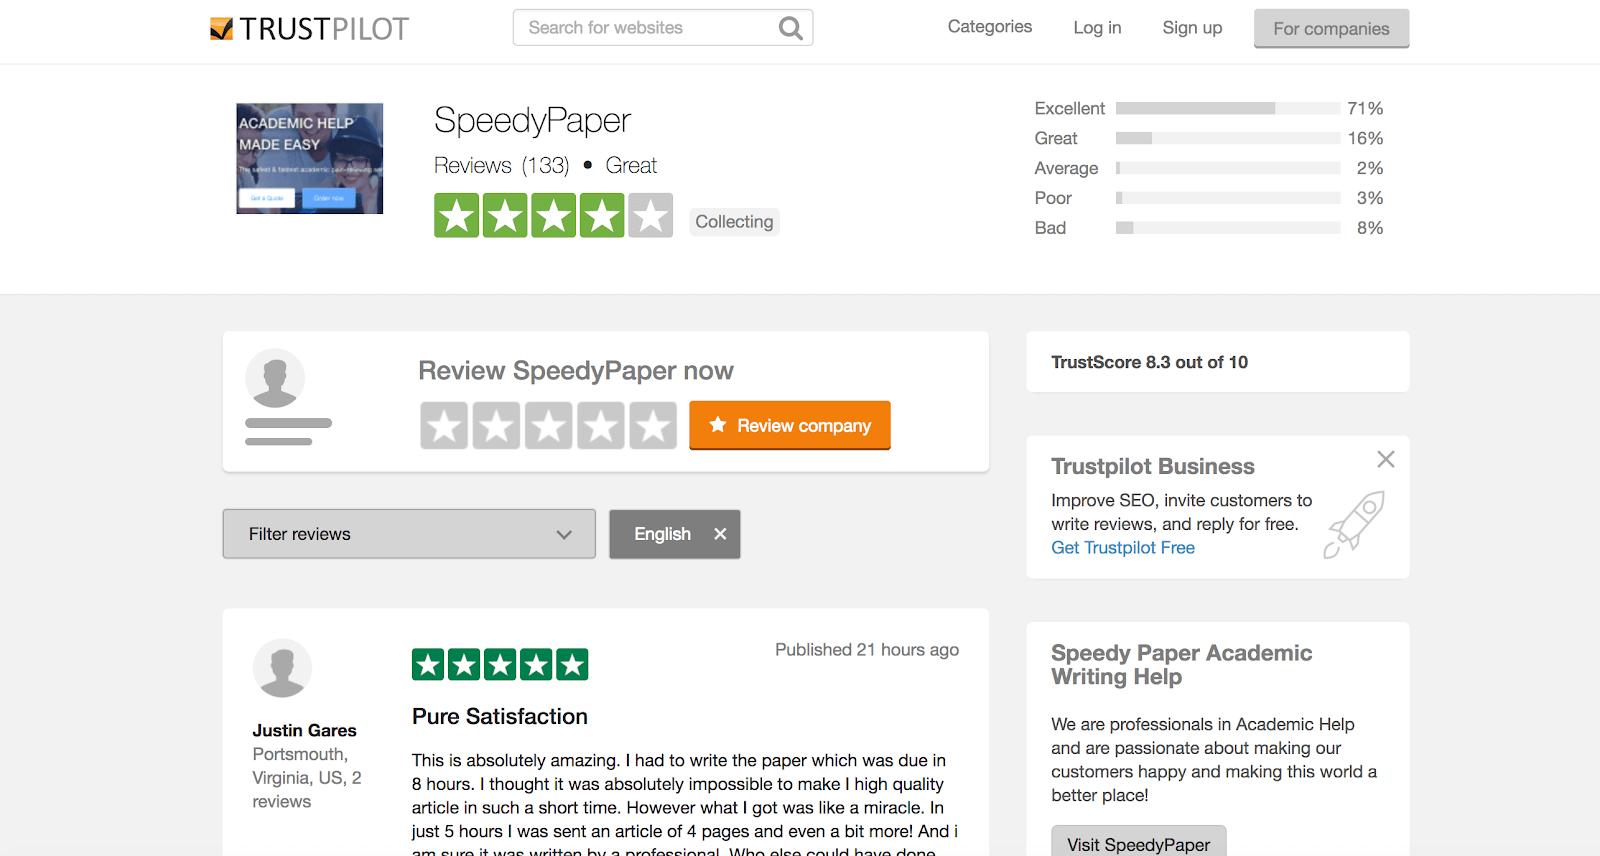 speedypaper reviews at trustpilot